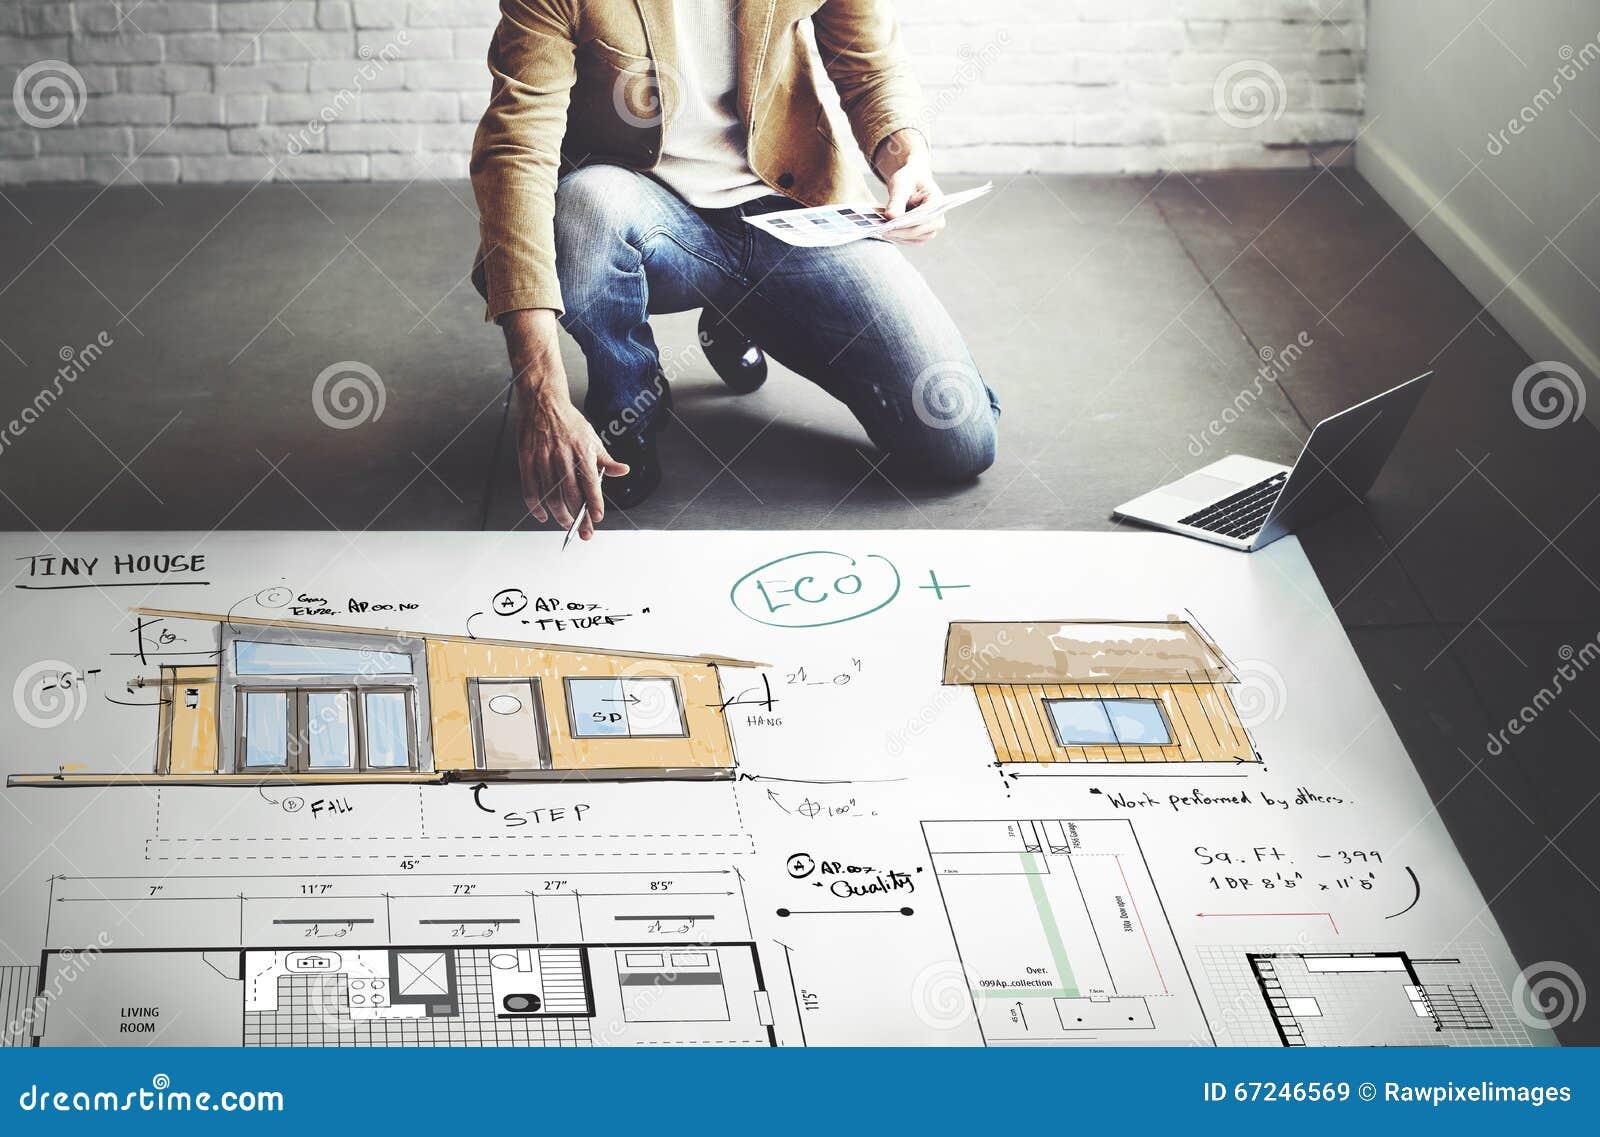 house layout floor plan blueprint sketch concept stock